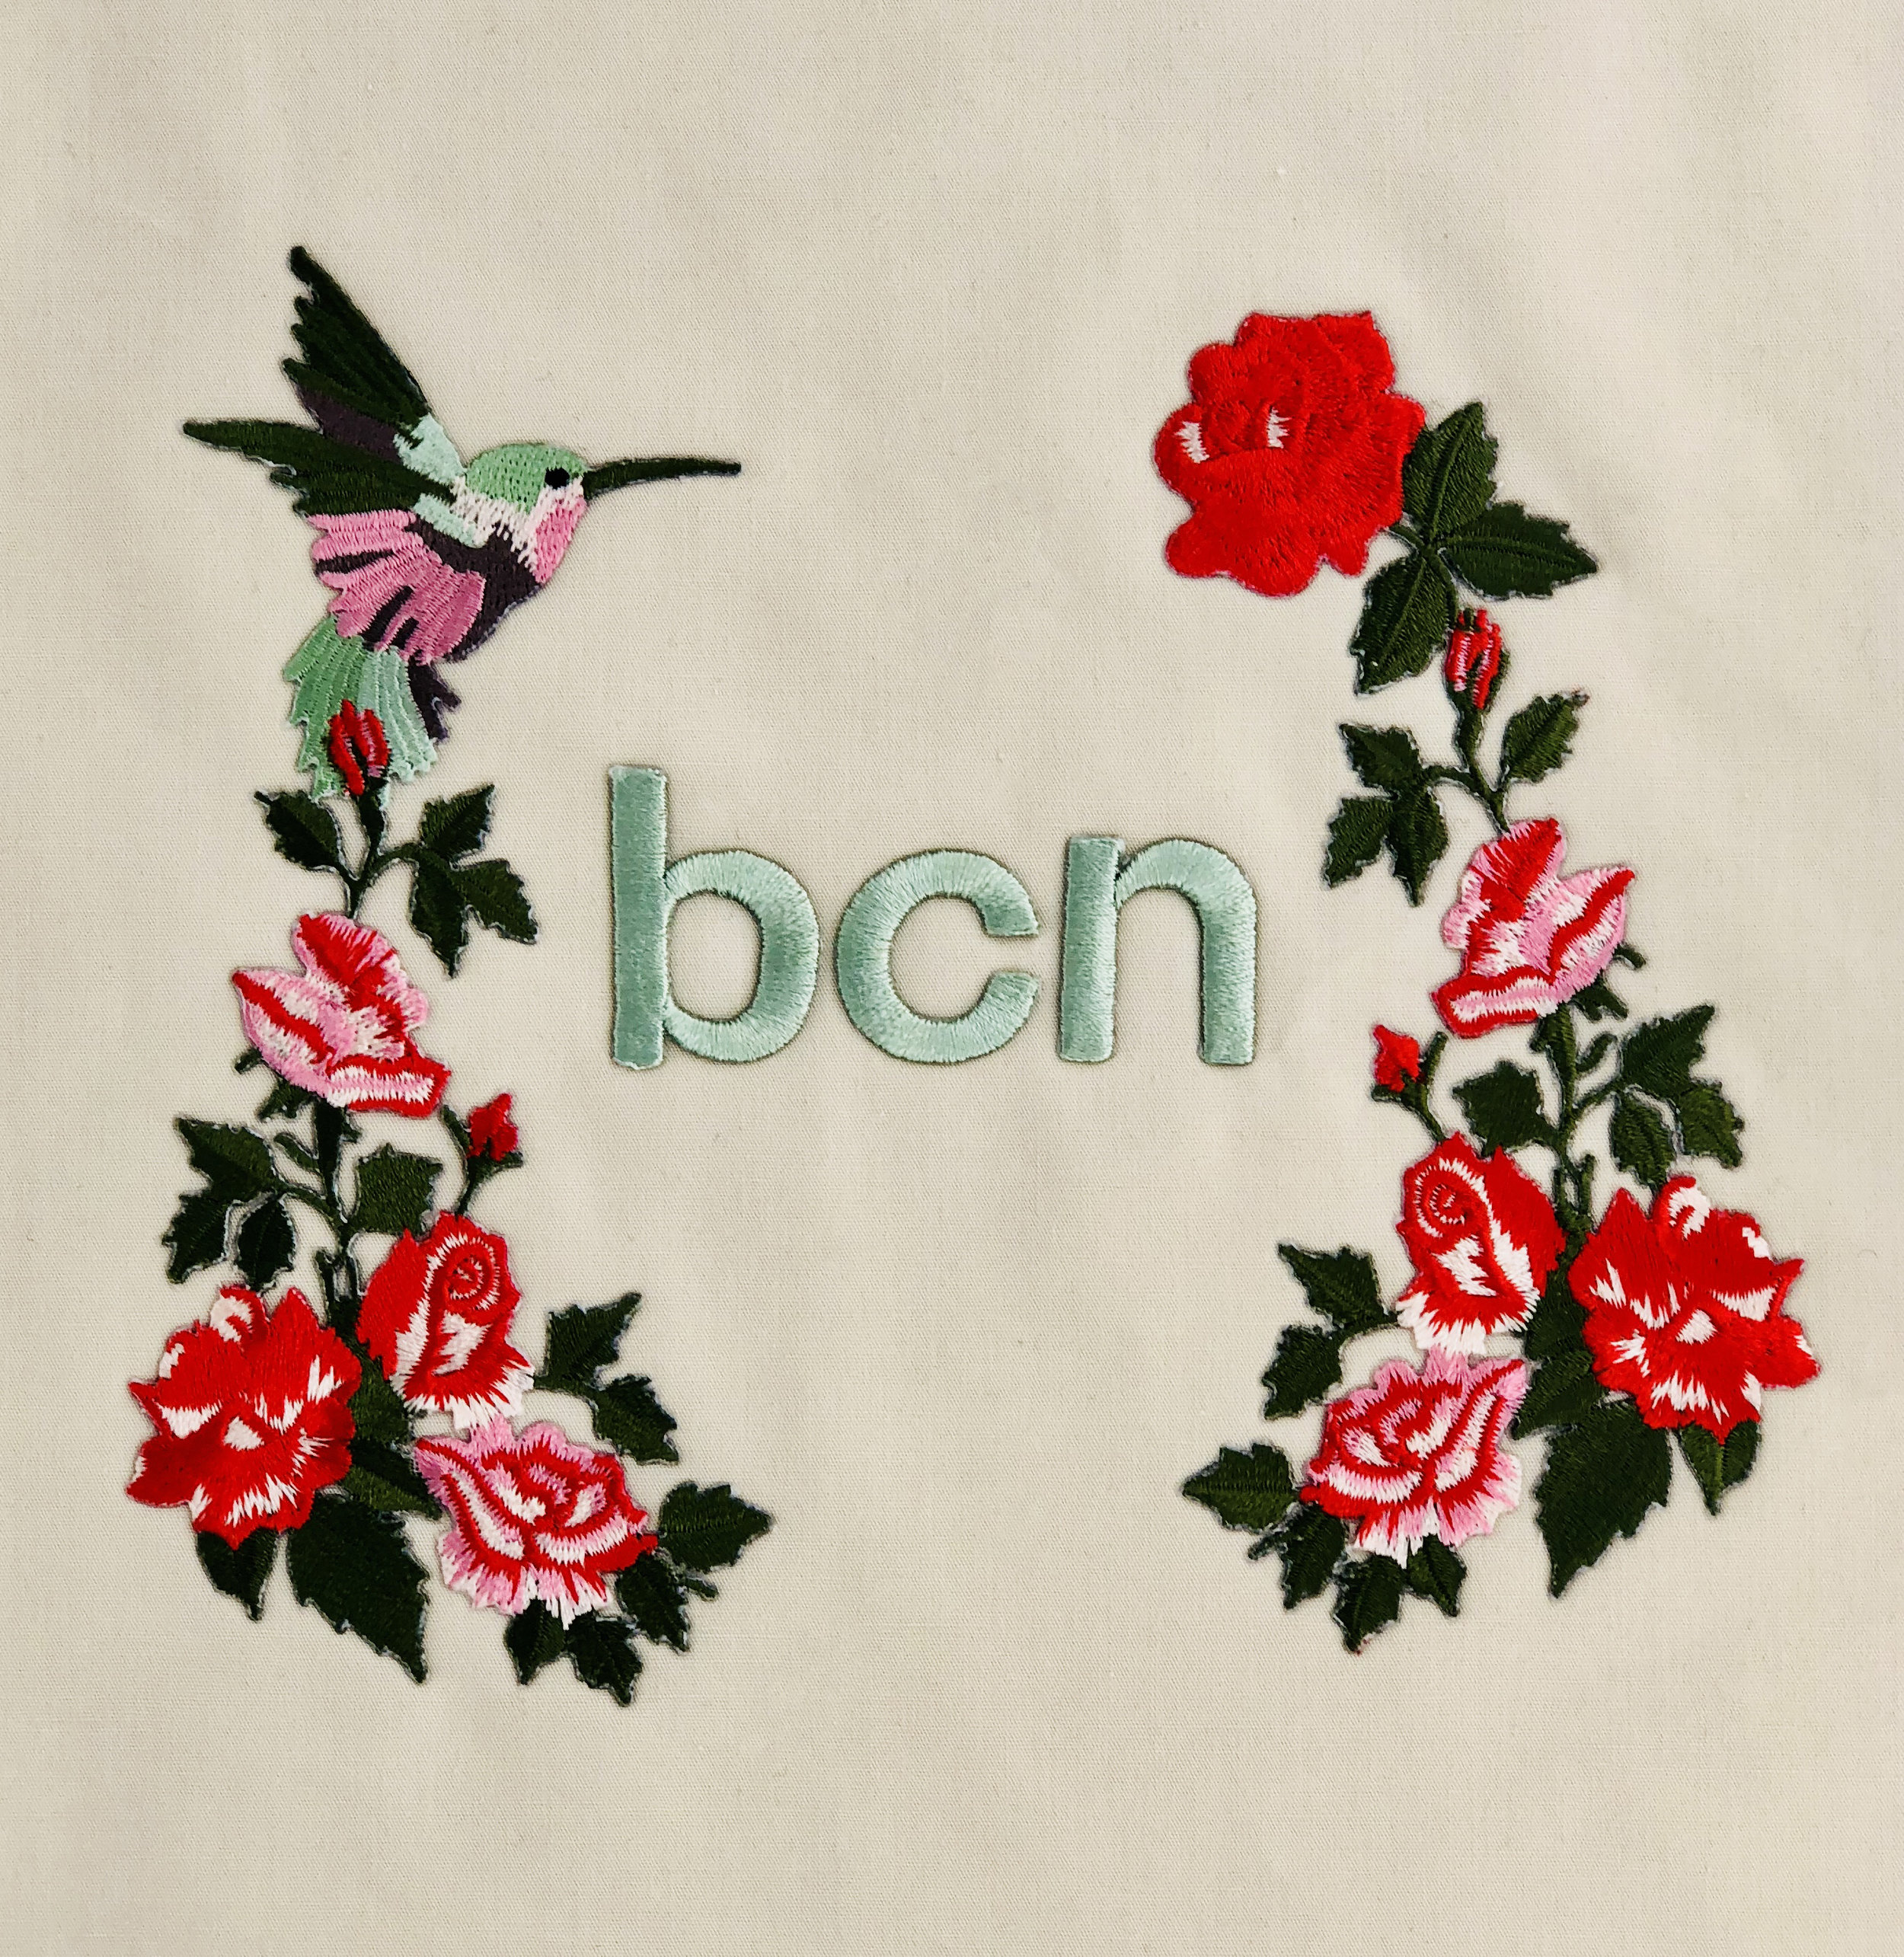 bcn colibri.jpg